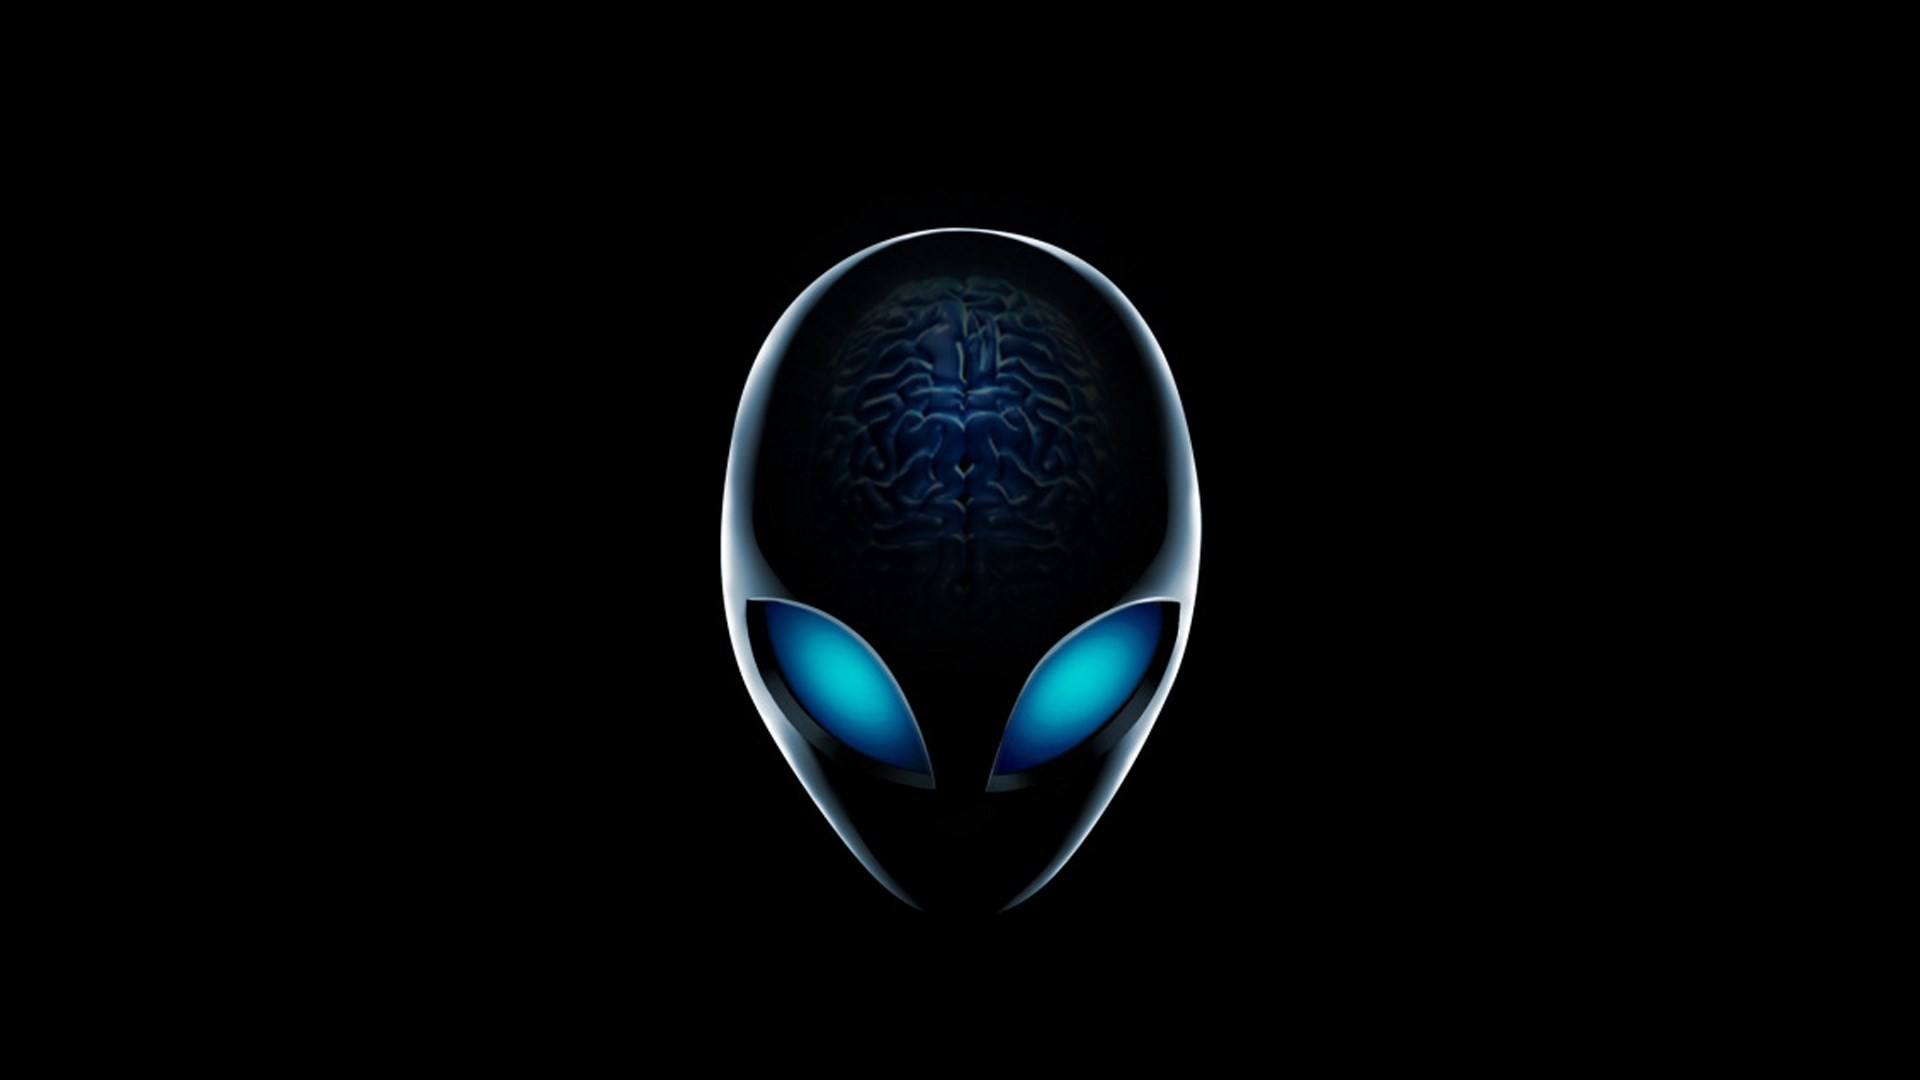 Blue Alienware Wallpaper ·① WallpaperTag